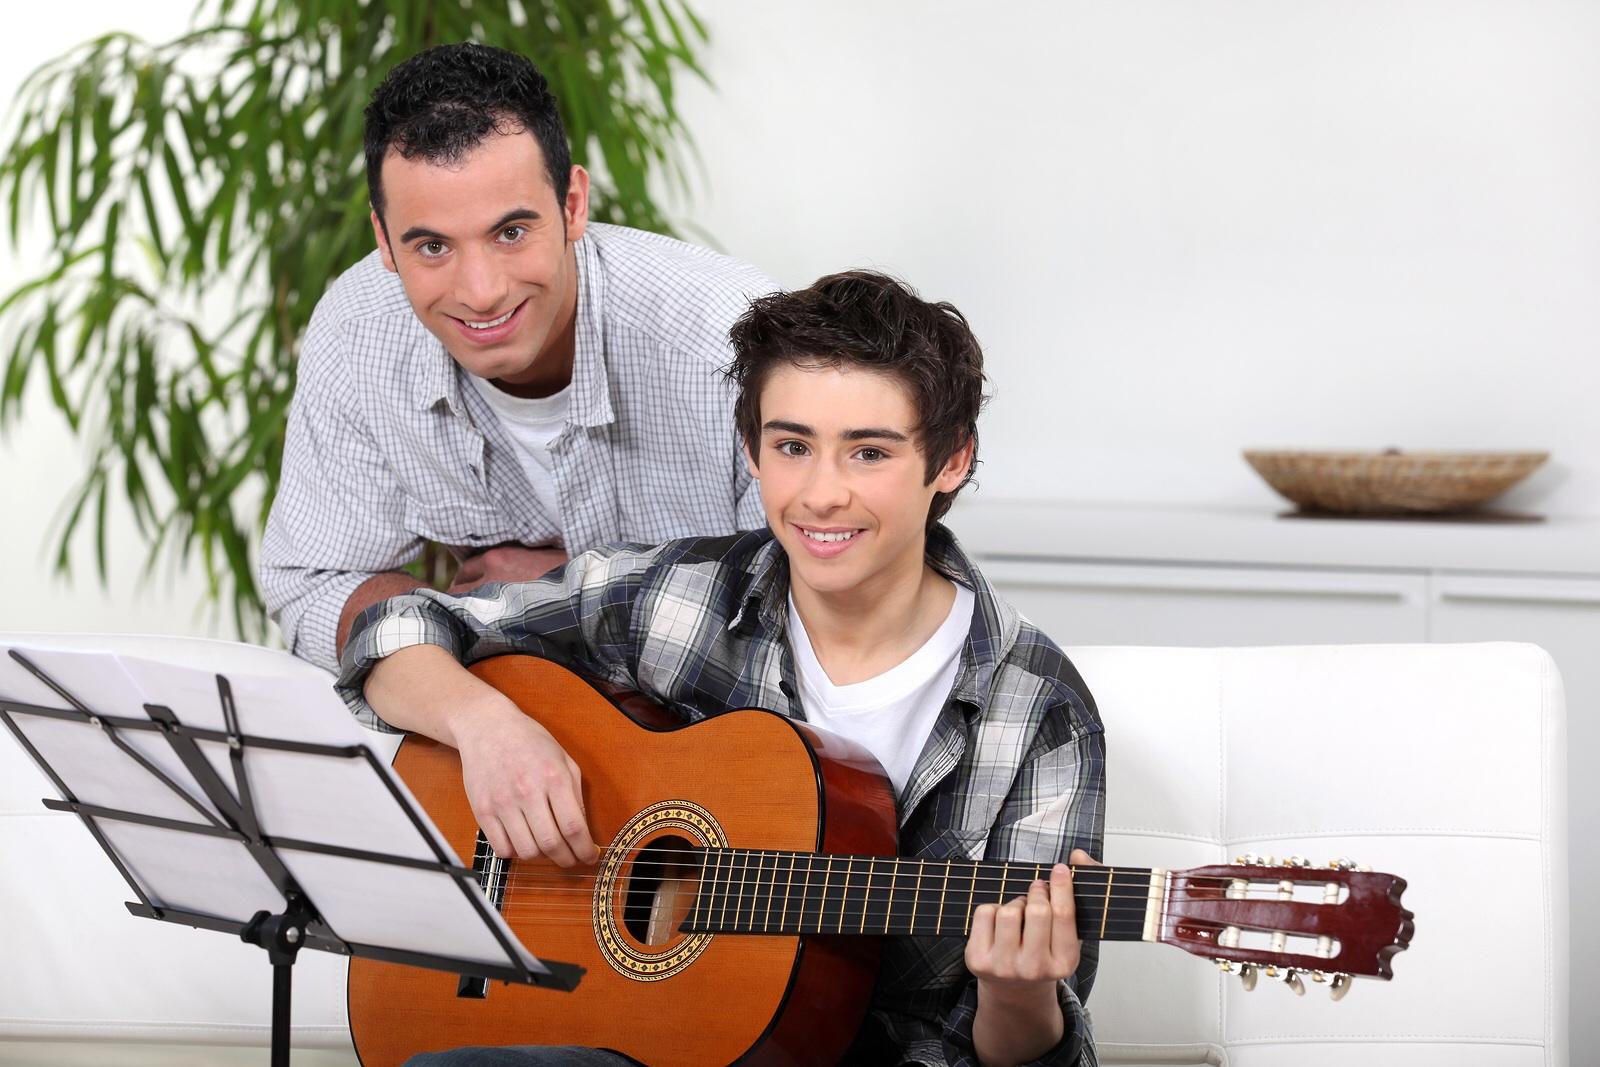 Northwest School of Music Guitar Lessons